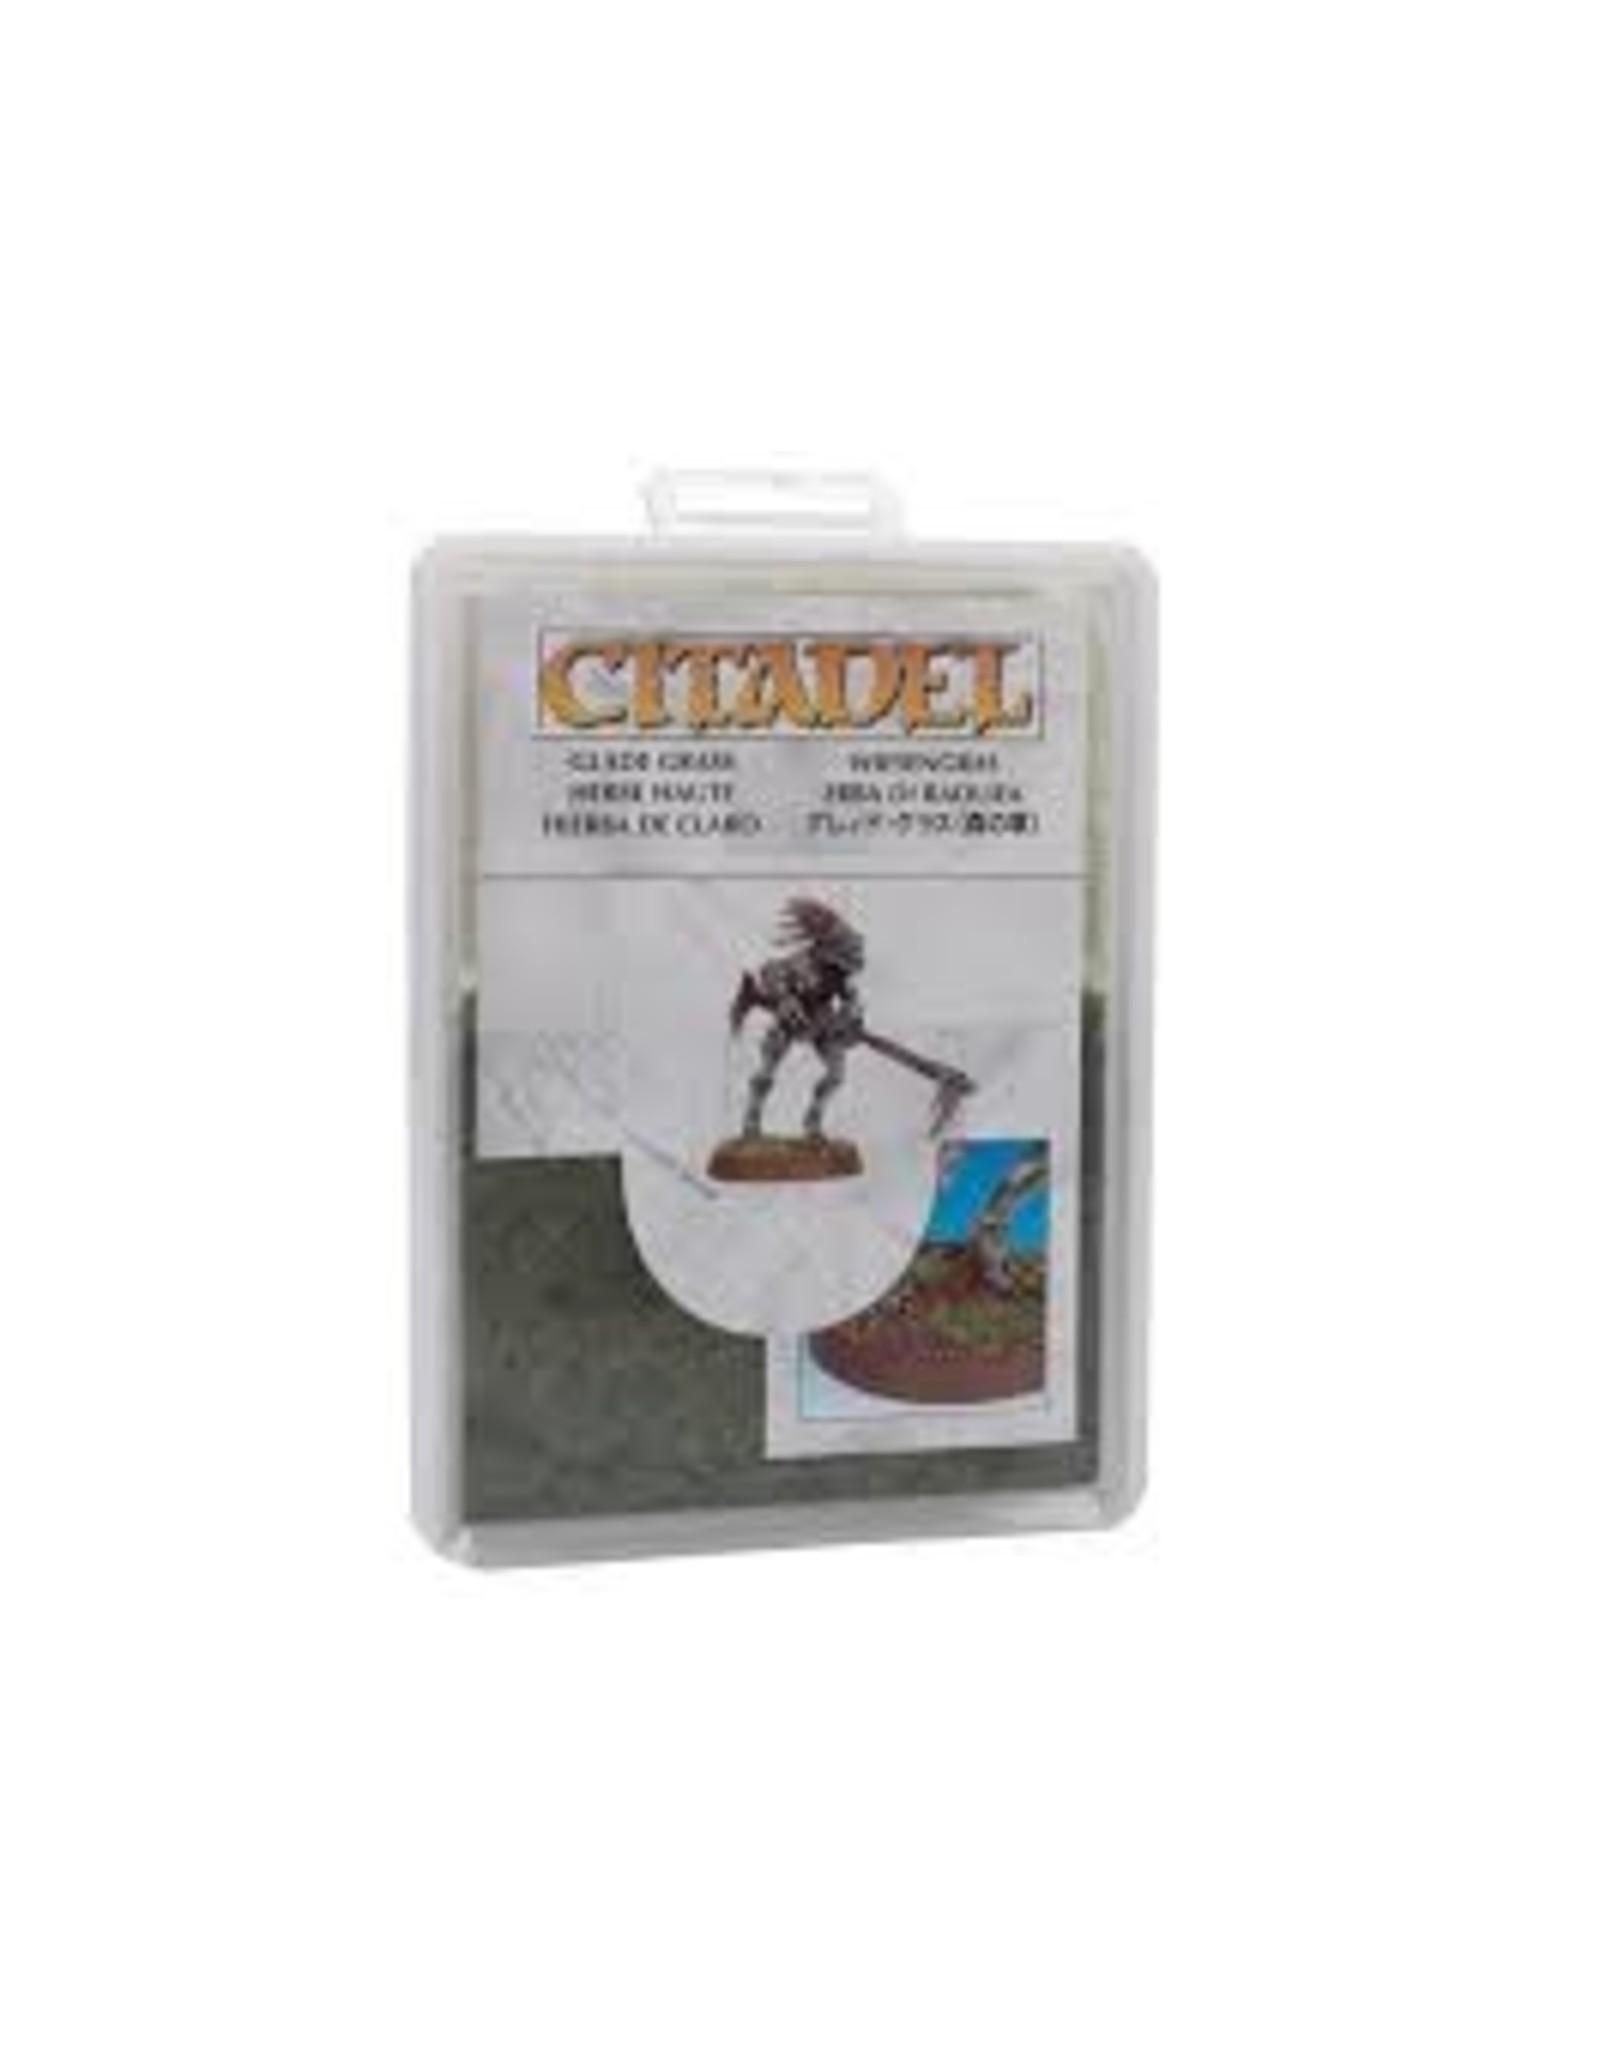 Citadel Glade Grass 15G